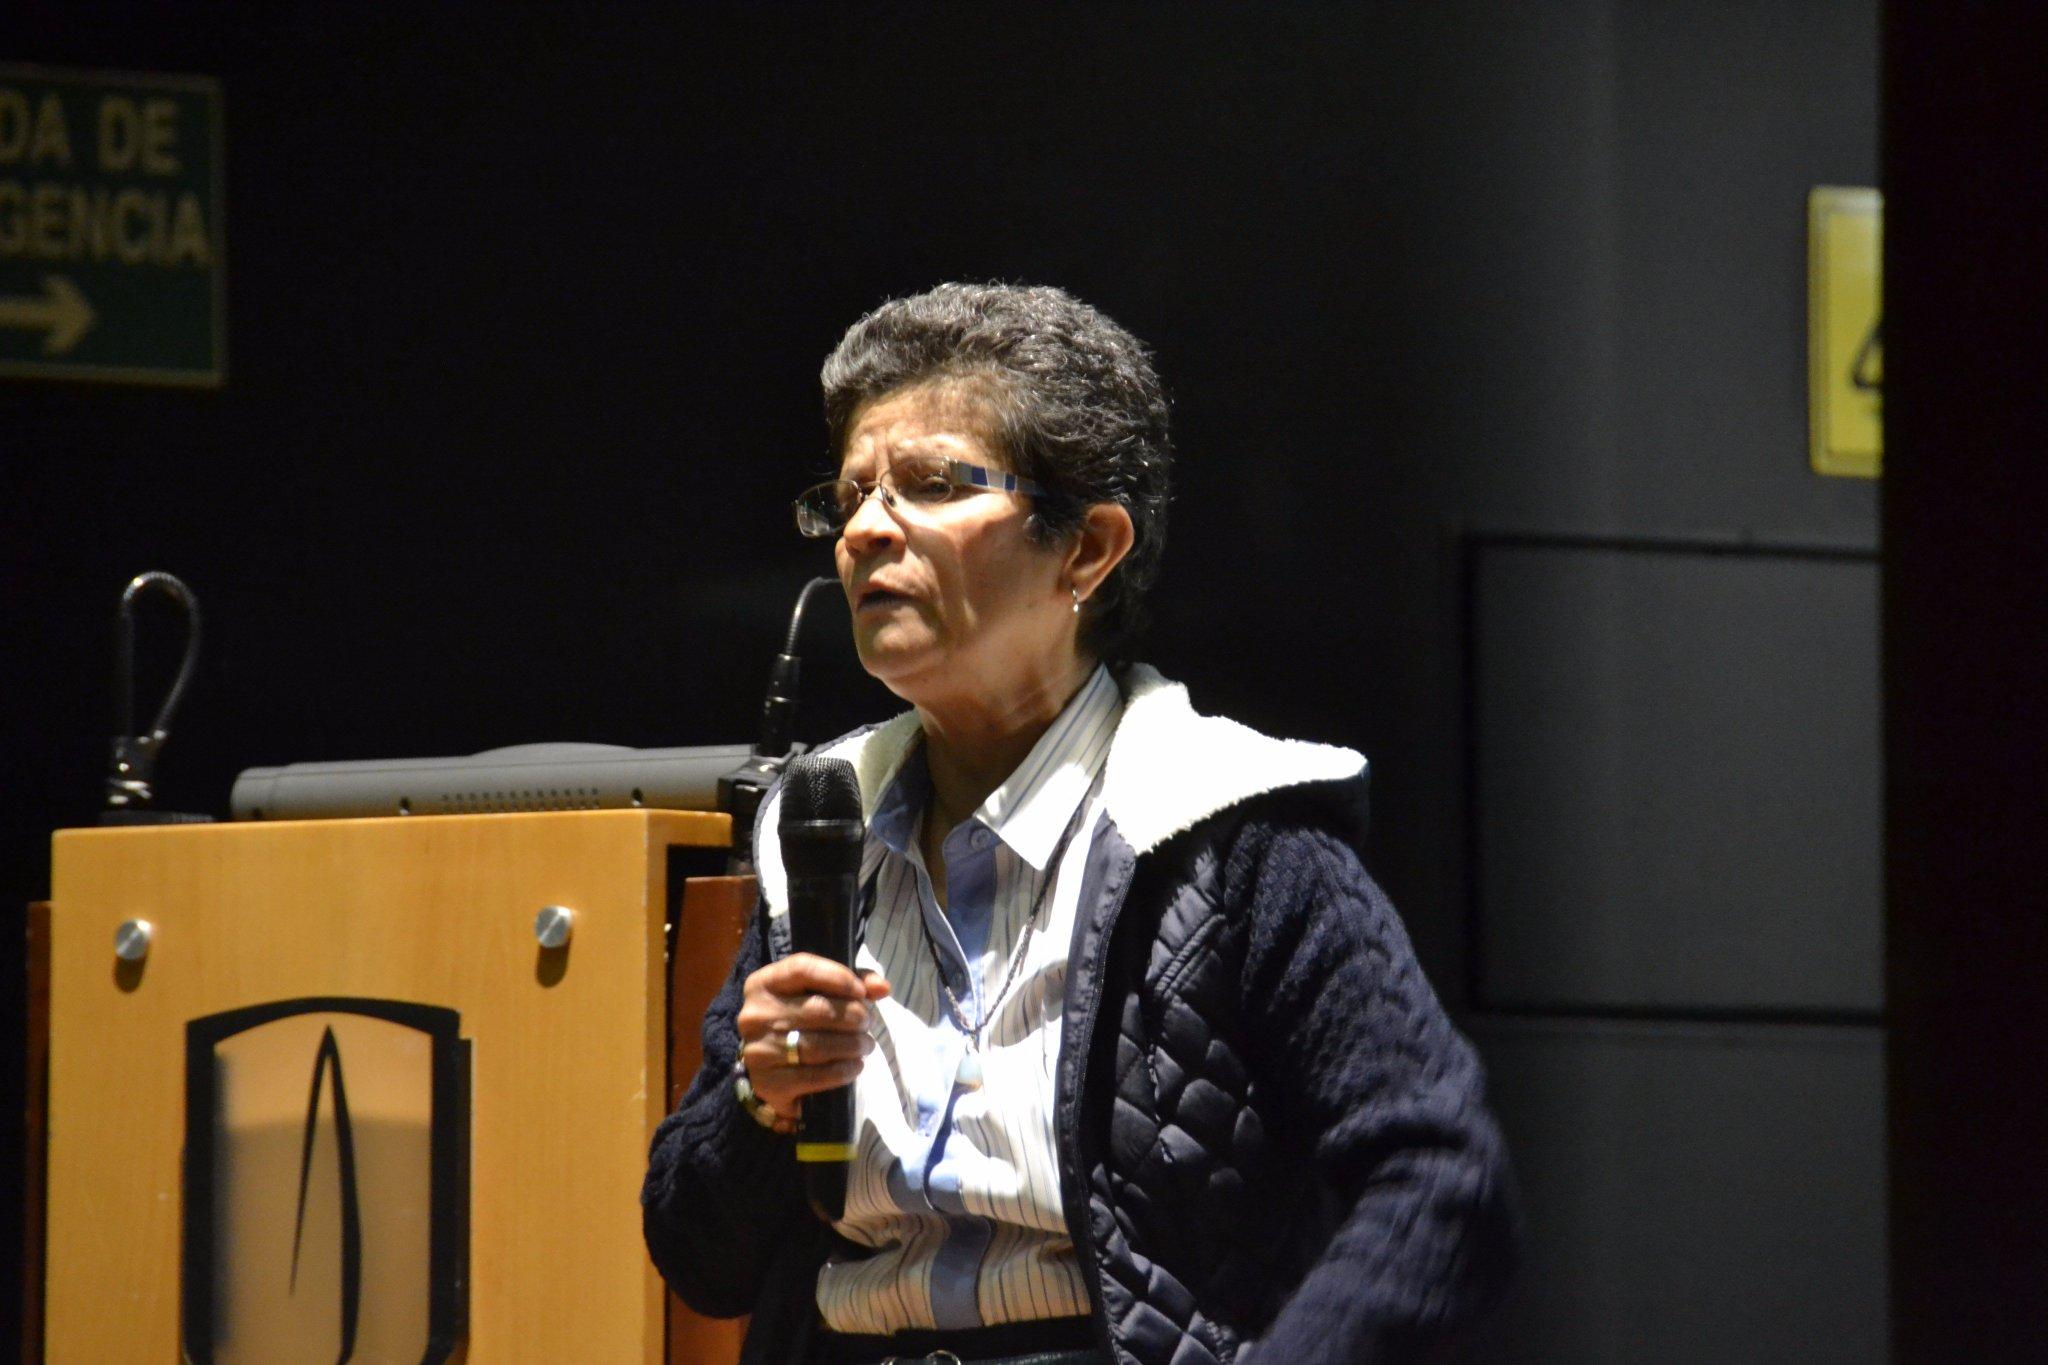 Interviene Clemencia Martínez, profesora de @UAmerica_edu Simposio #CrecimientoVerde #EnVivo: https://t.co/FHxrSkTWeg https://t.co/xMsg6VUYl6